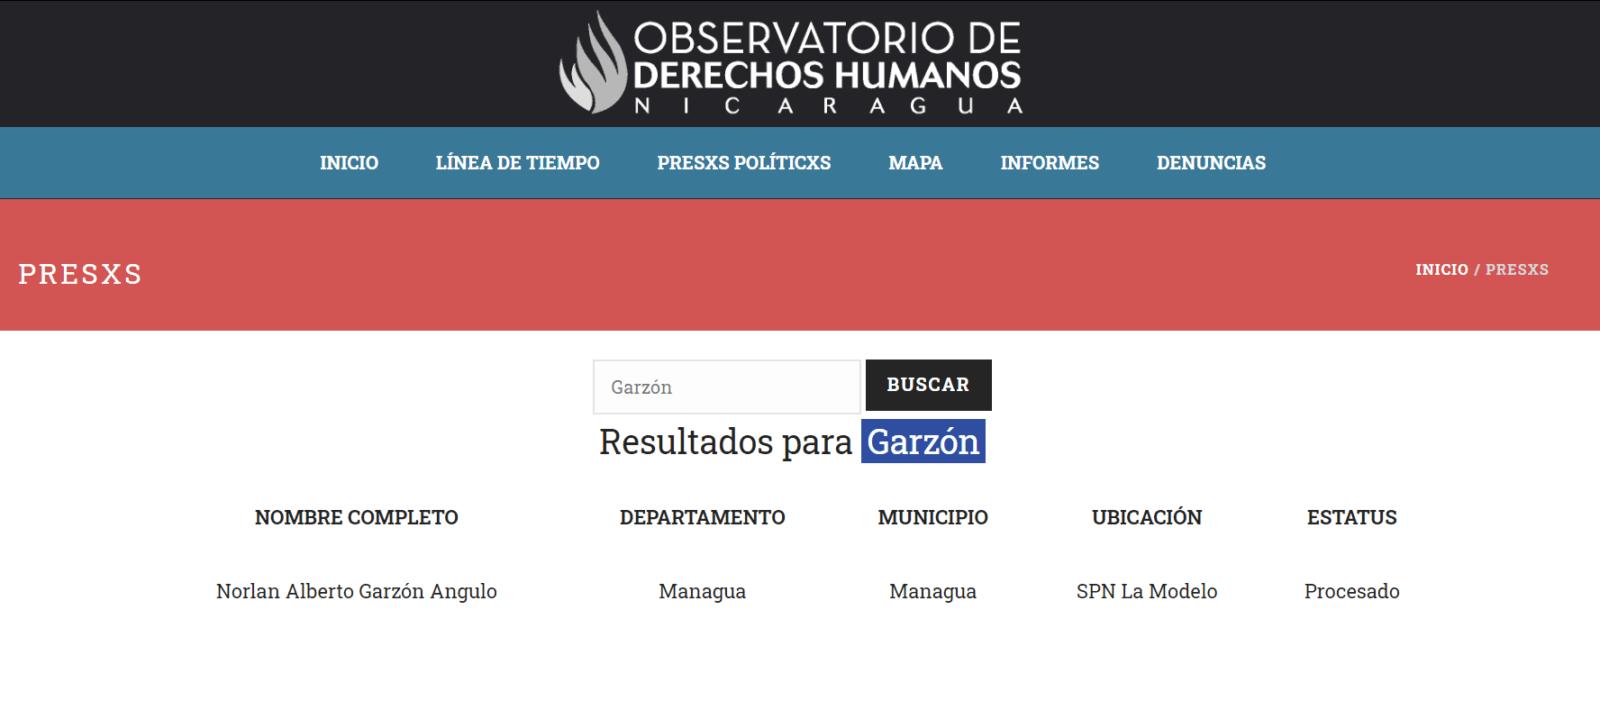 Nicaragua-human-rights-political-prisoner-Norlan-Alberto-Garzon-Angulo-murder